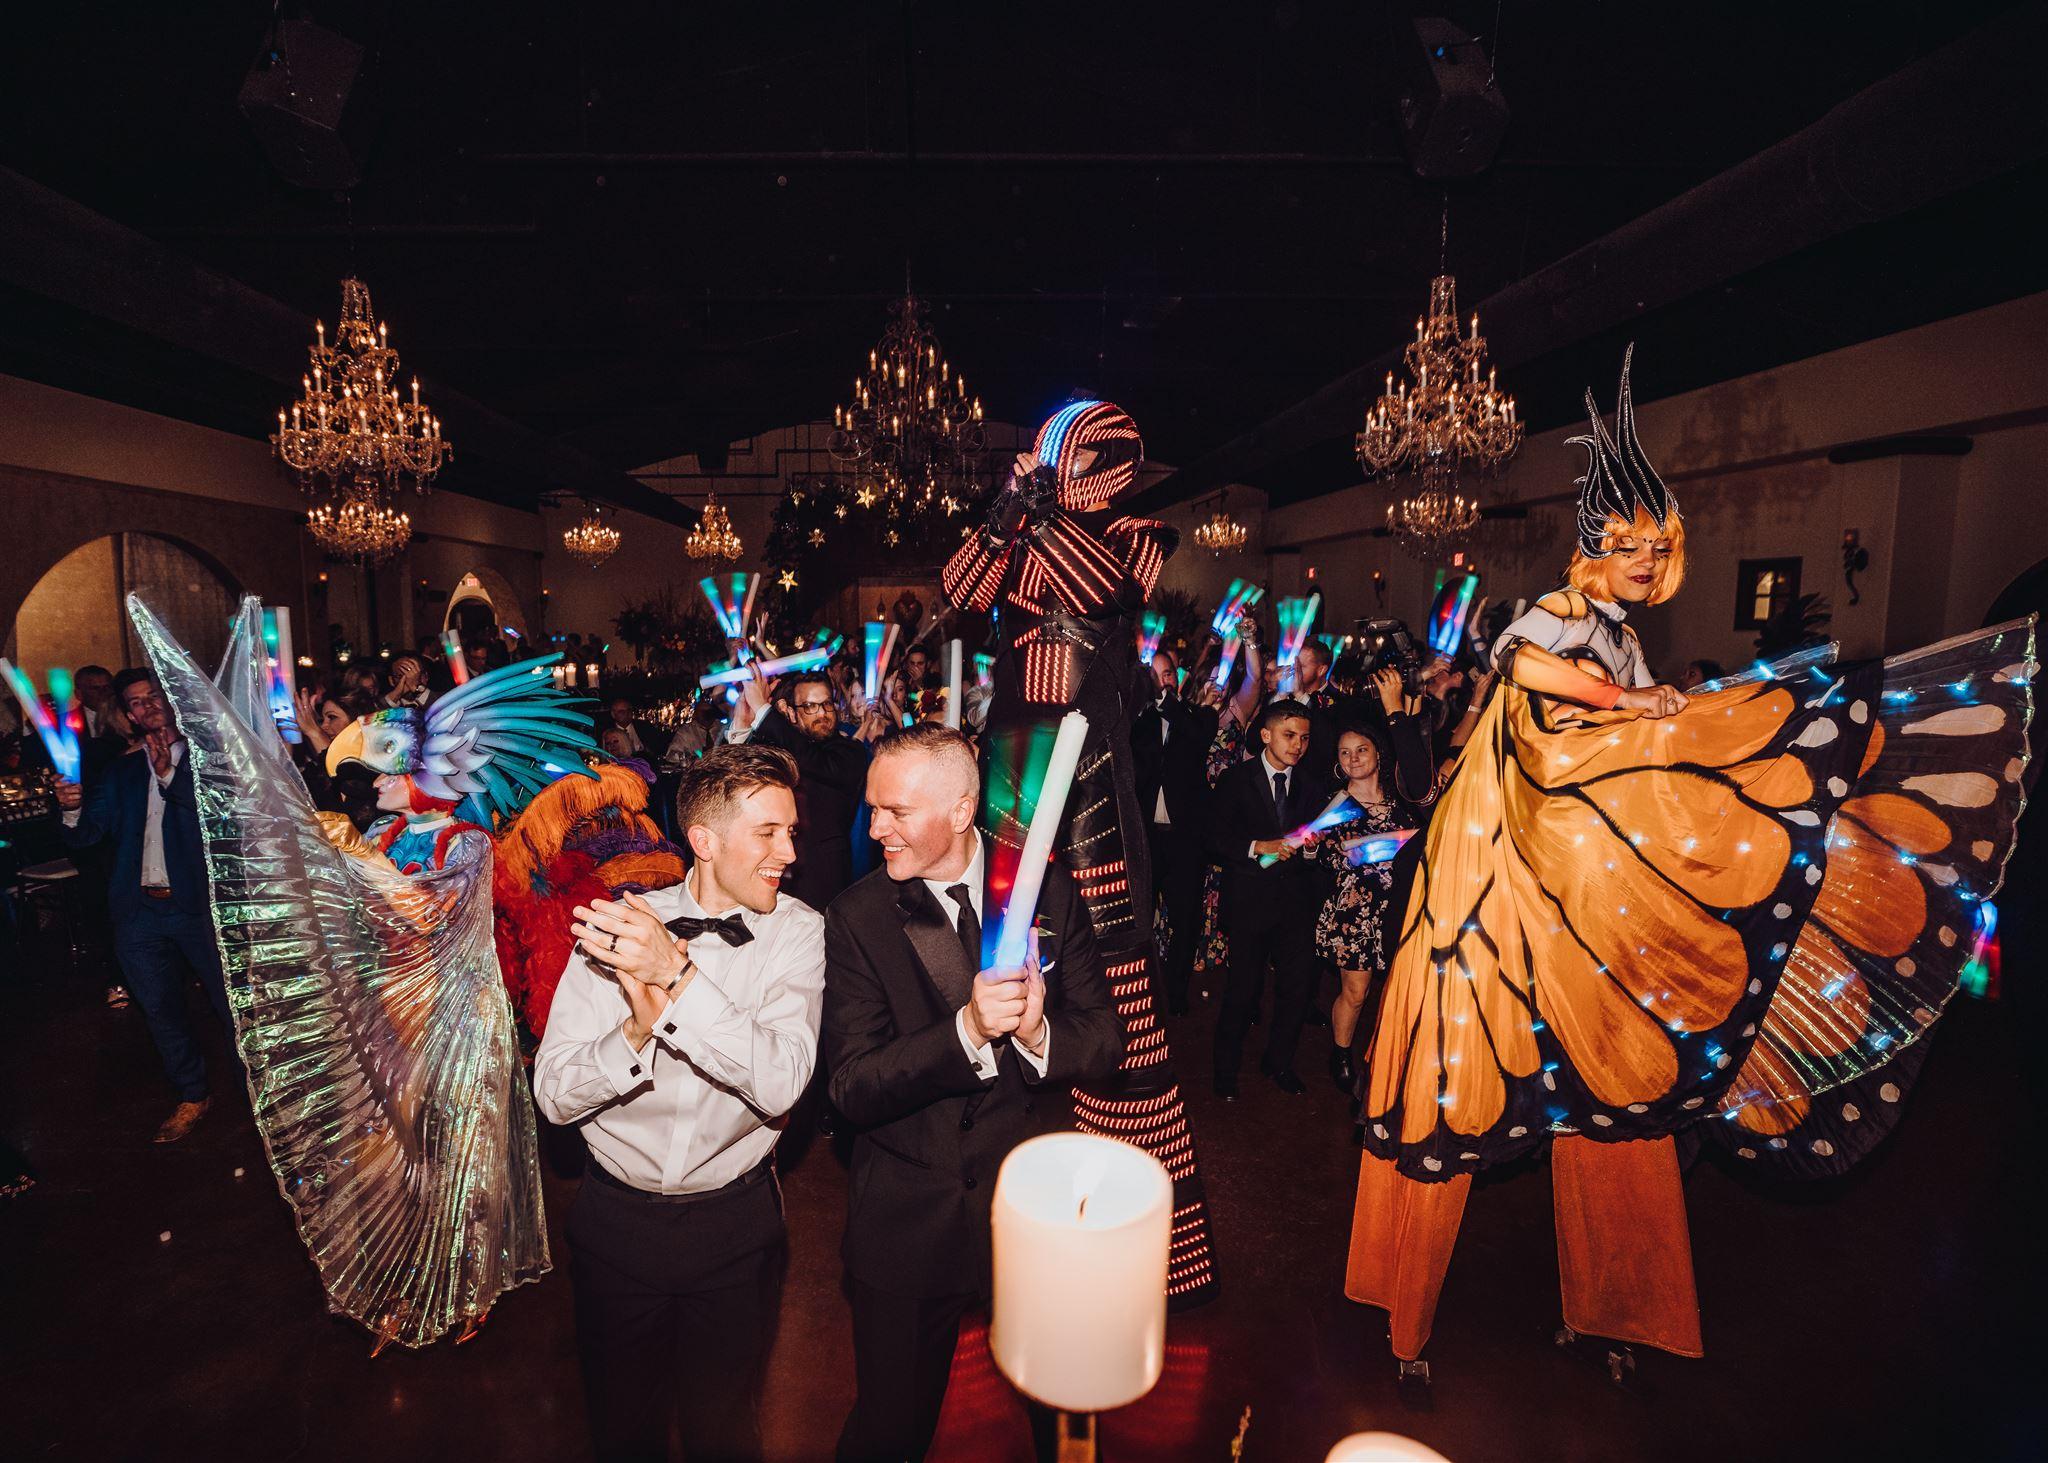 Live Wedding Entertainment at Madera Estates in Conroe, Texas